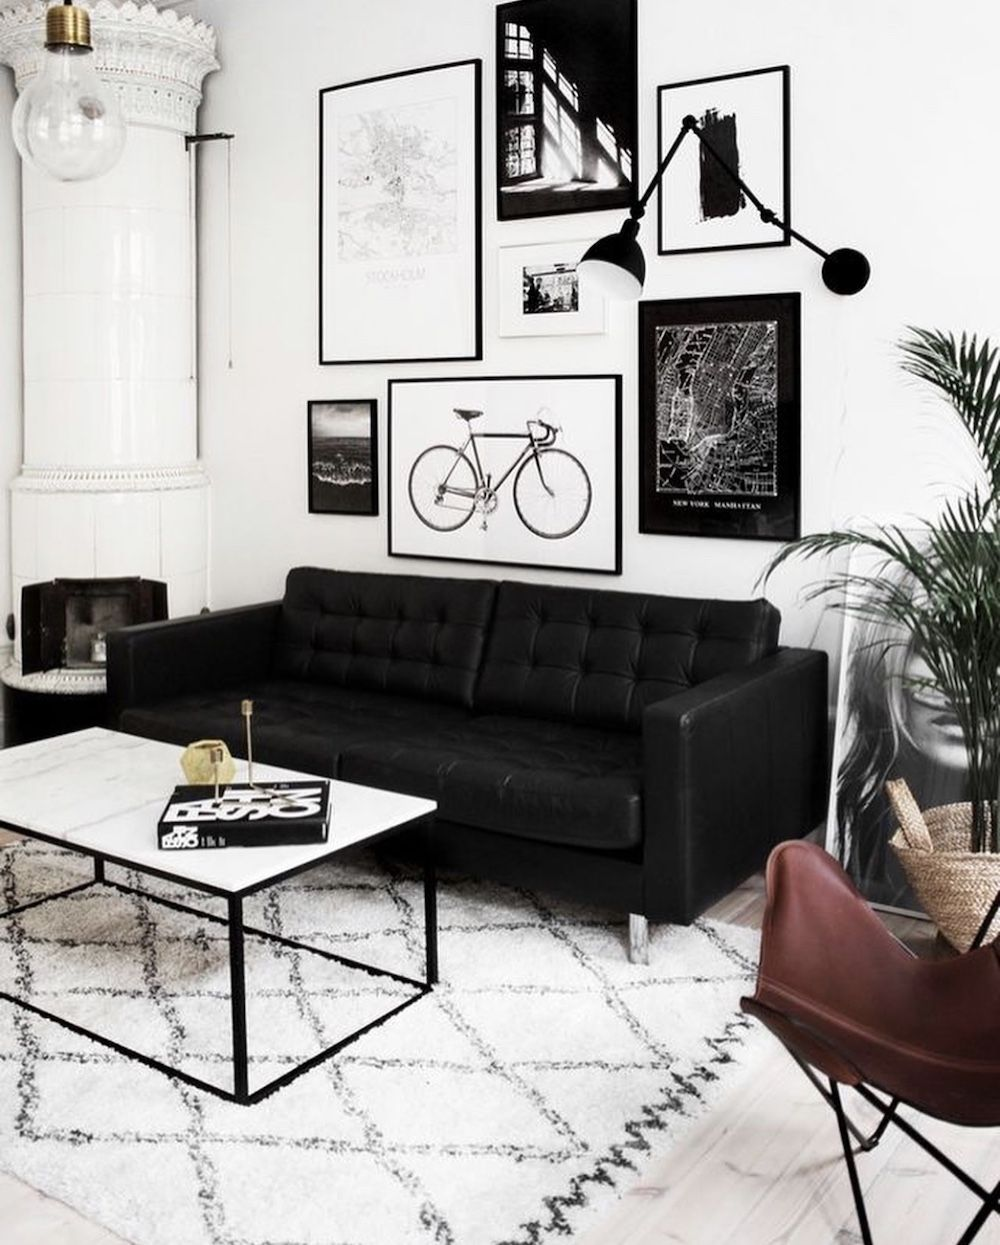 10 Black Sofas For A Dramatic Look Black Sofa Living Room Living Room White White Living Room Decor #tufted #sofa #living #room #ideas